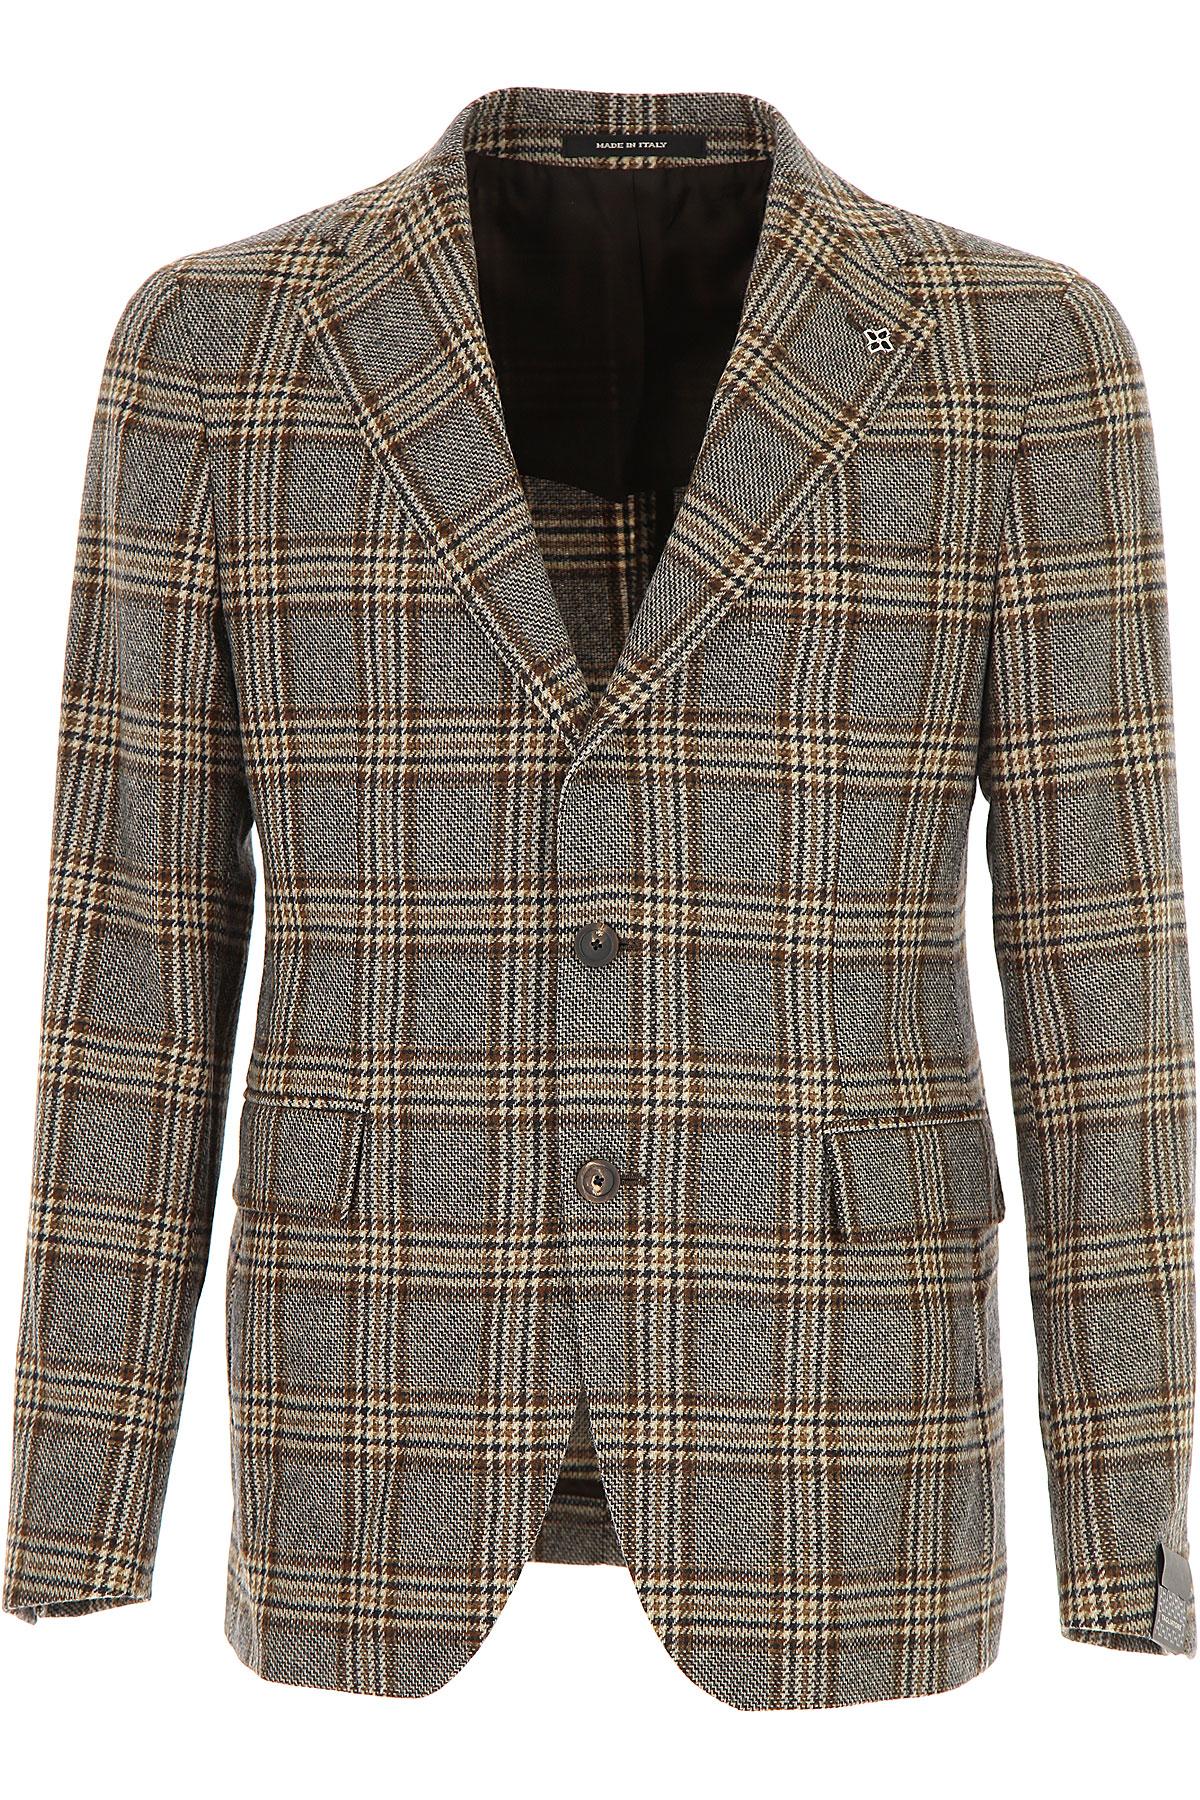 Image of Tagliatore Blazer for Men, Sport Coat, Beige, Wool, 2017, L M XL